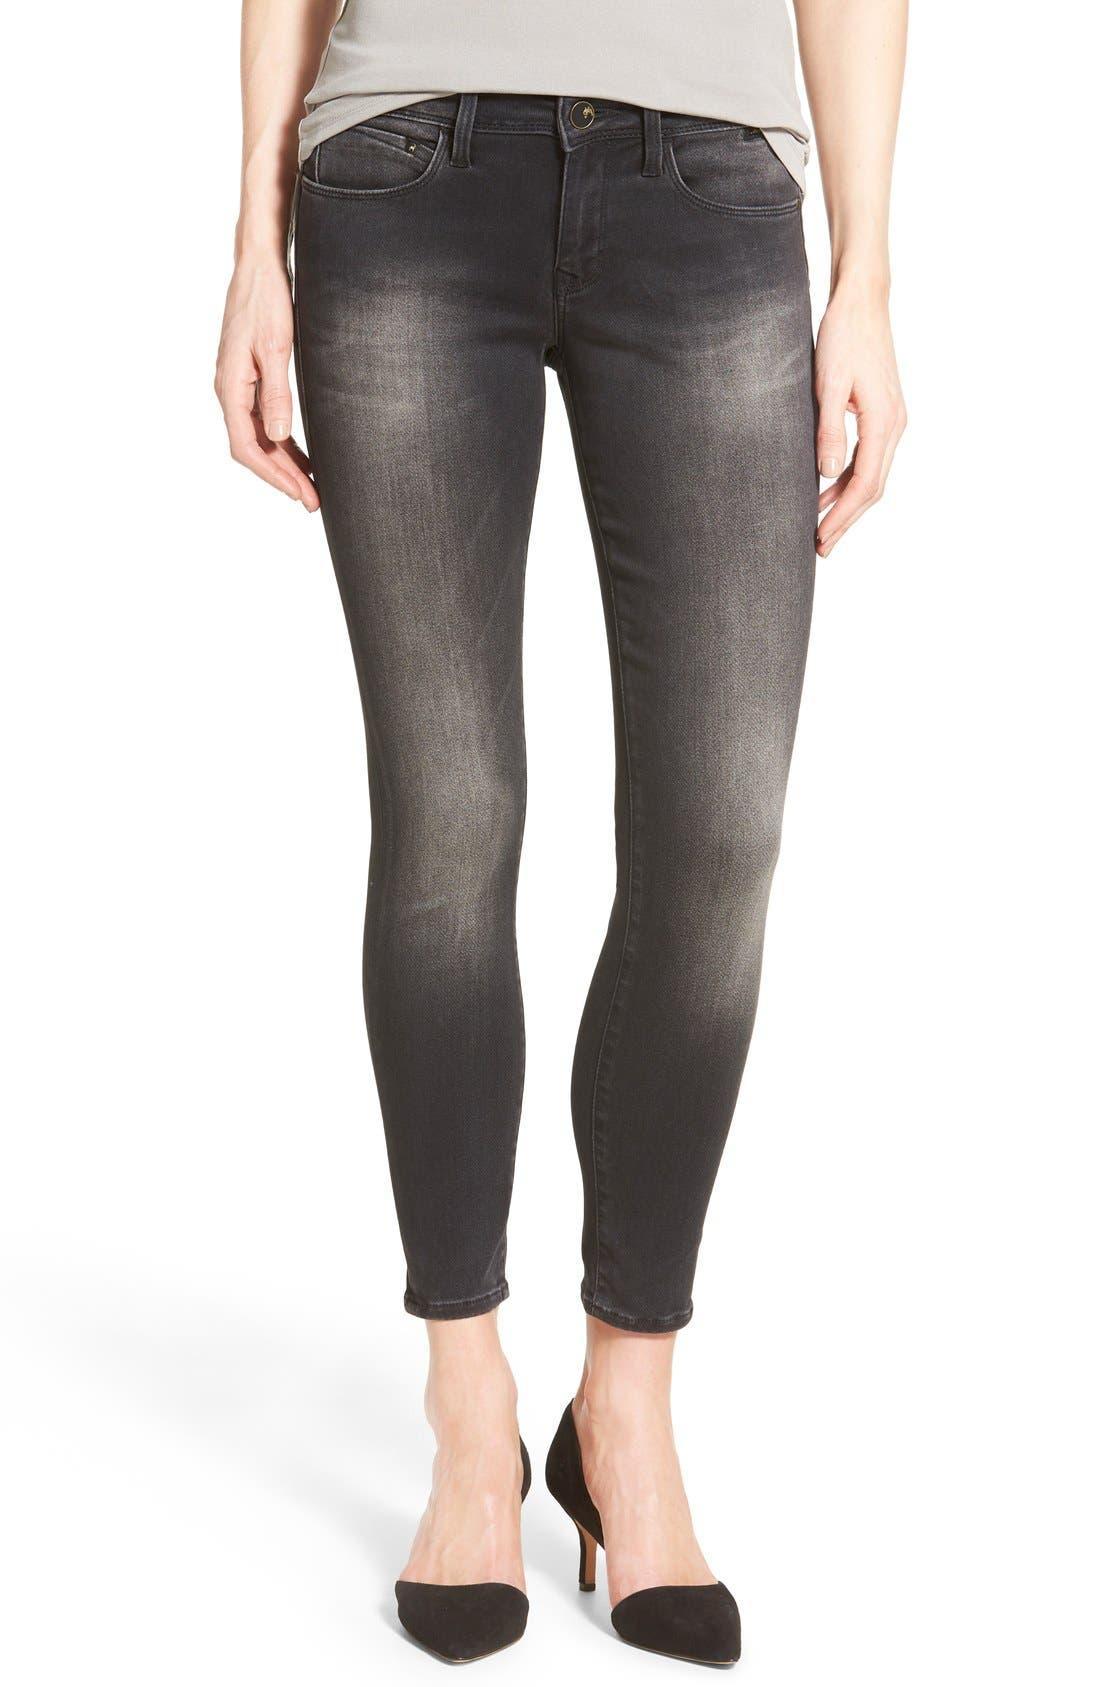 MAVI JEANS Gold 'Alexa' Stretch Ankle Skinny Jeans